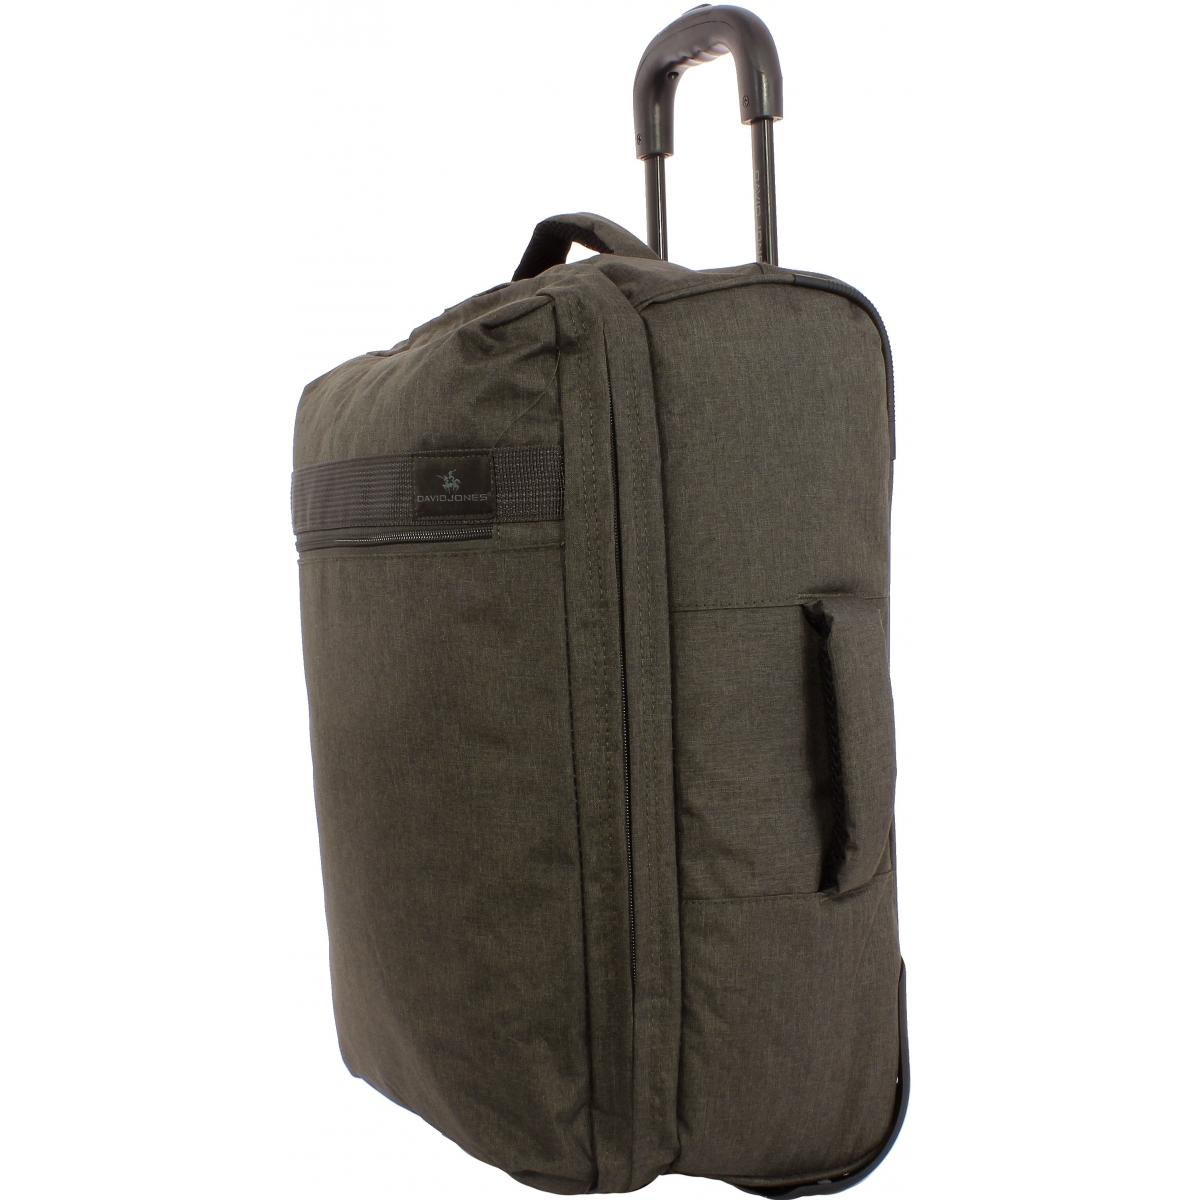 sac de voyage roulettes david jones taille s ba60251s. Black Bedroom Furniture Sets. Home Design Ideas